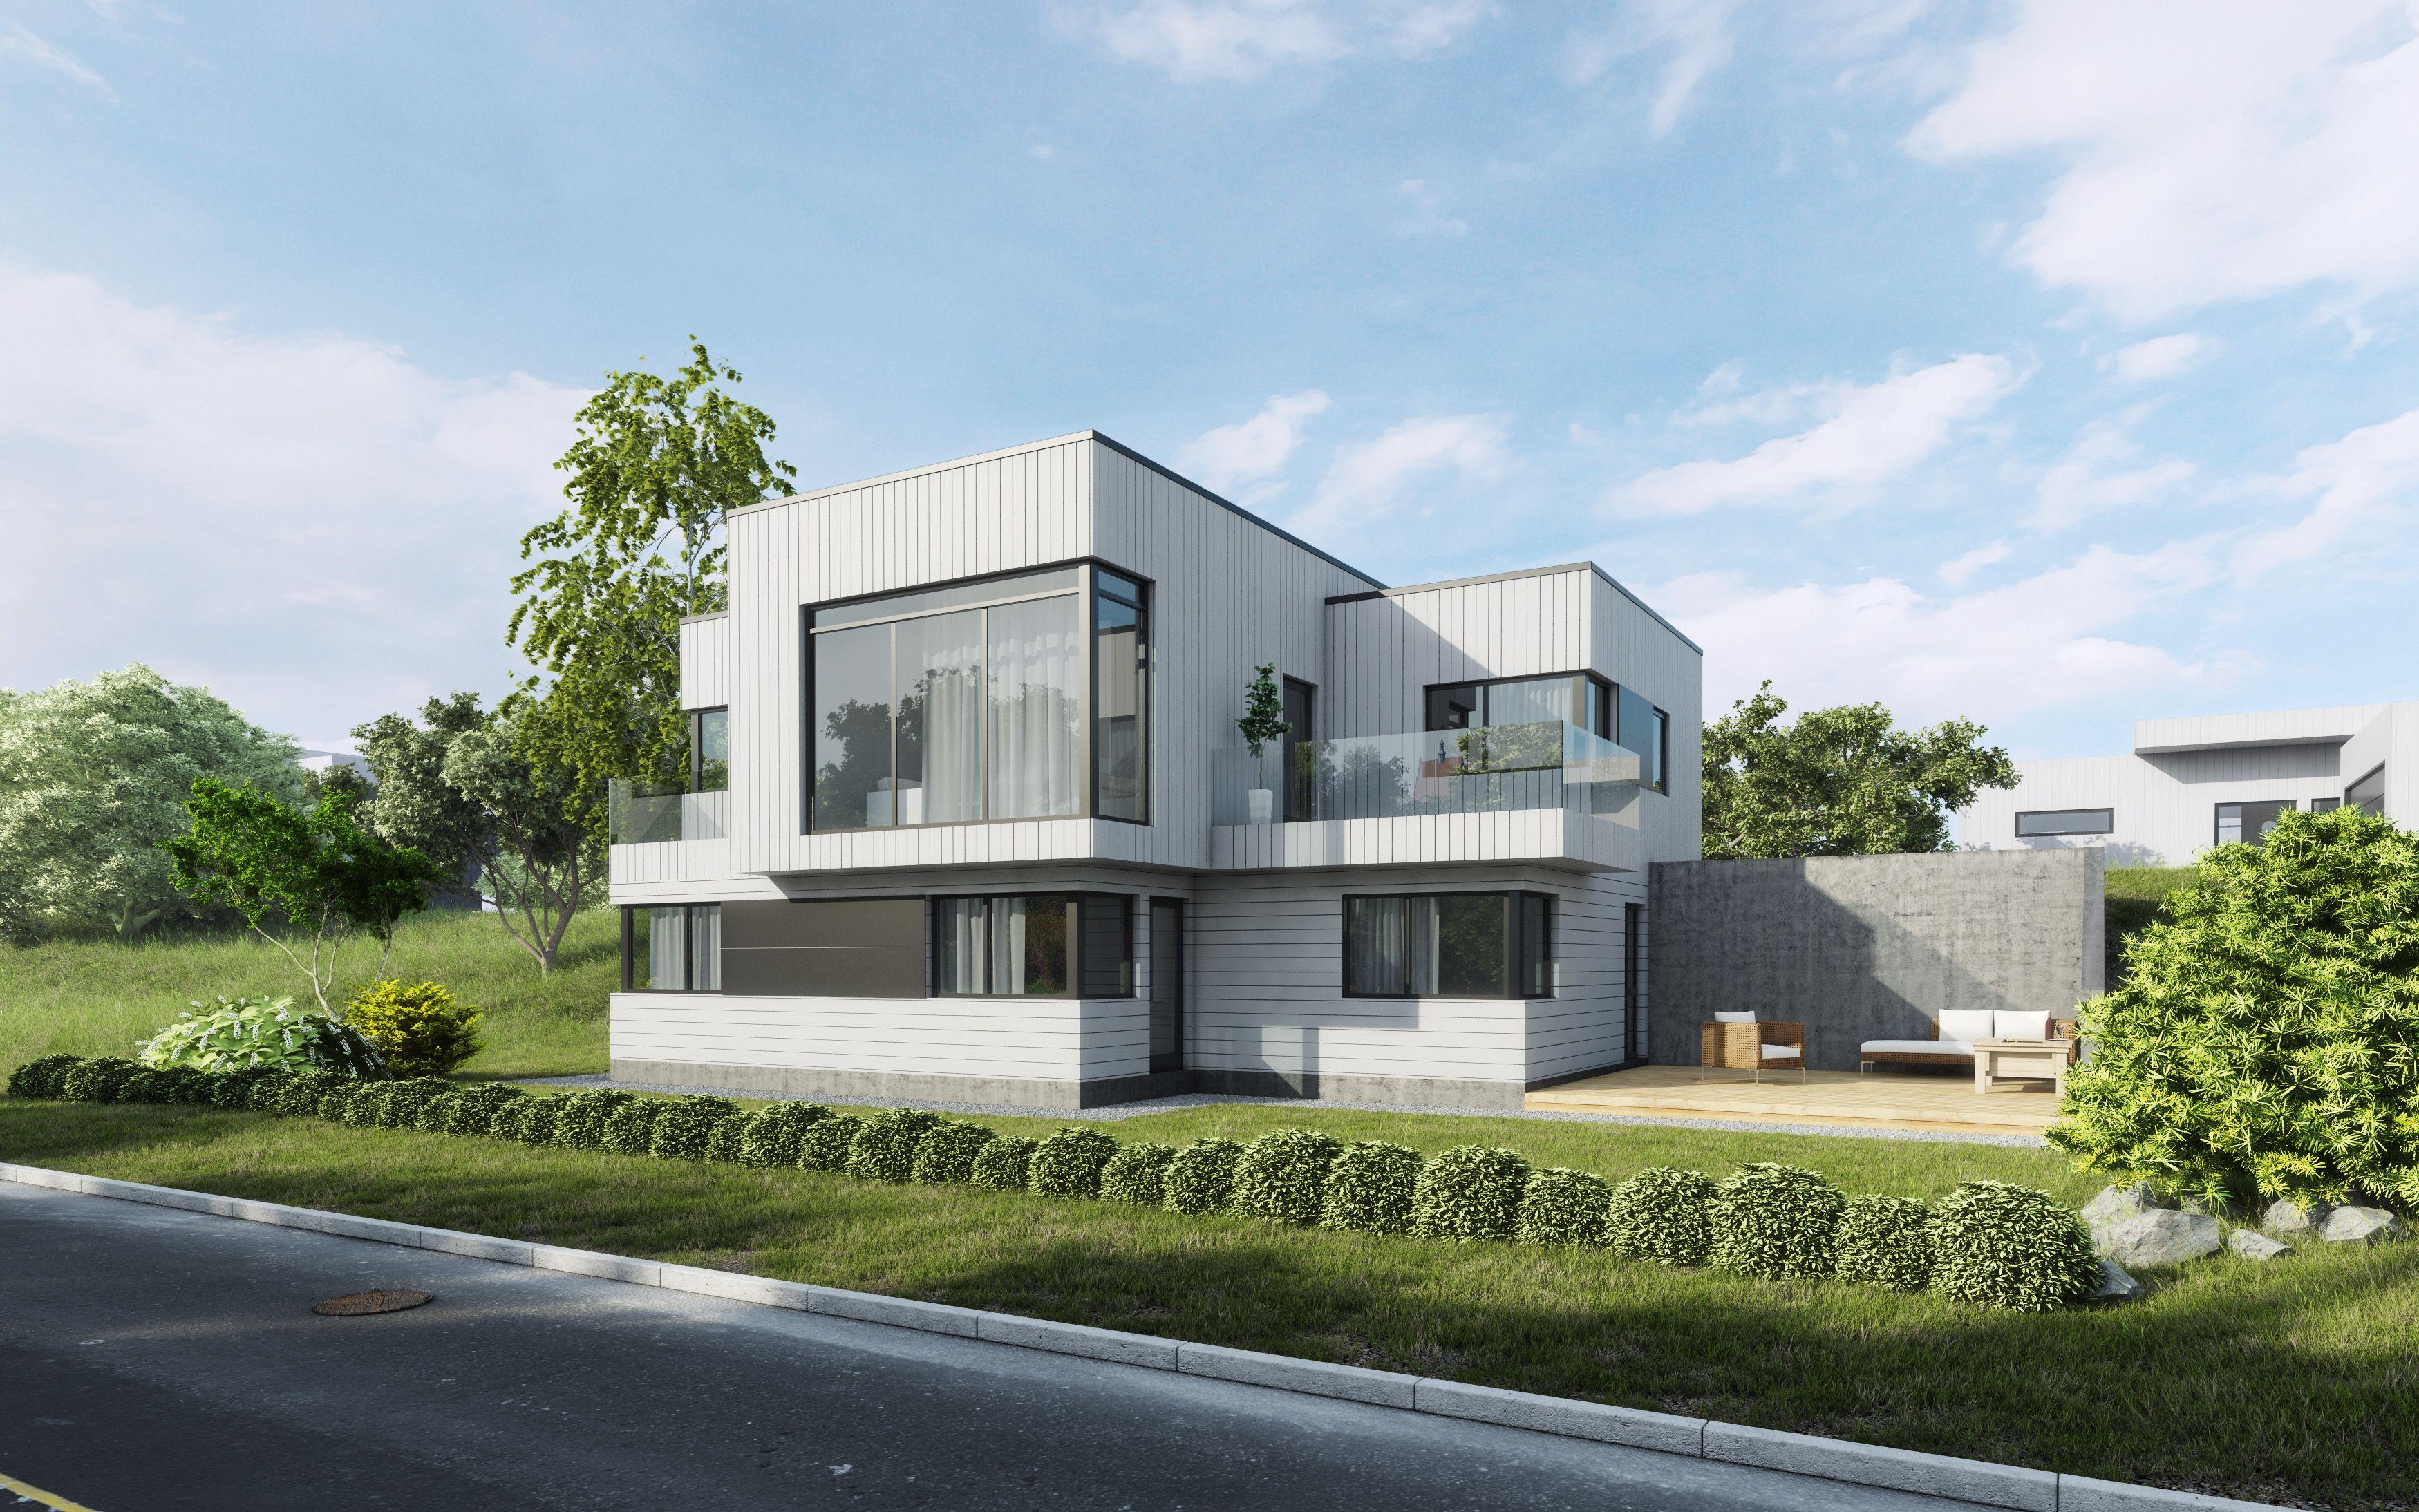 Funkis house plans house plans for Funkis house